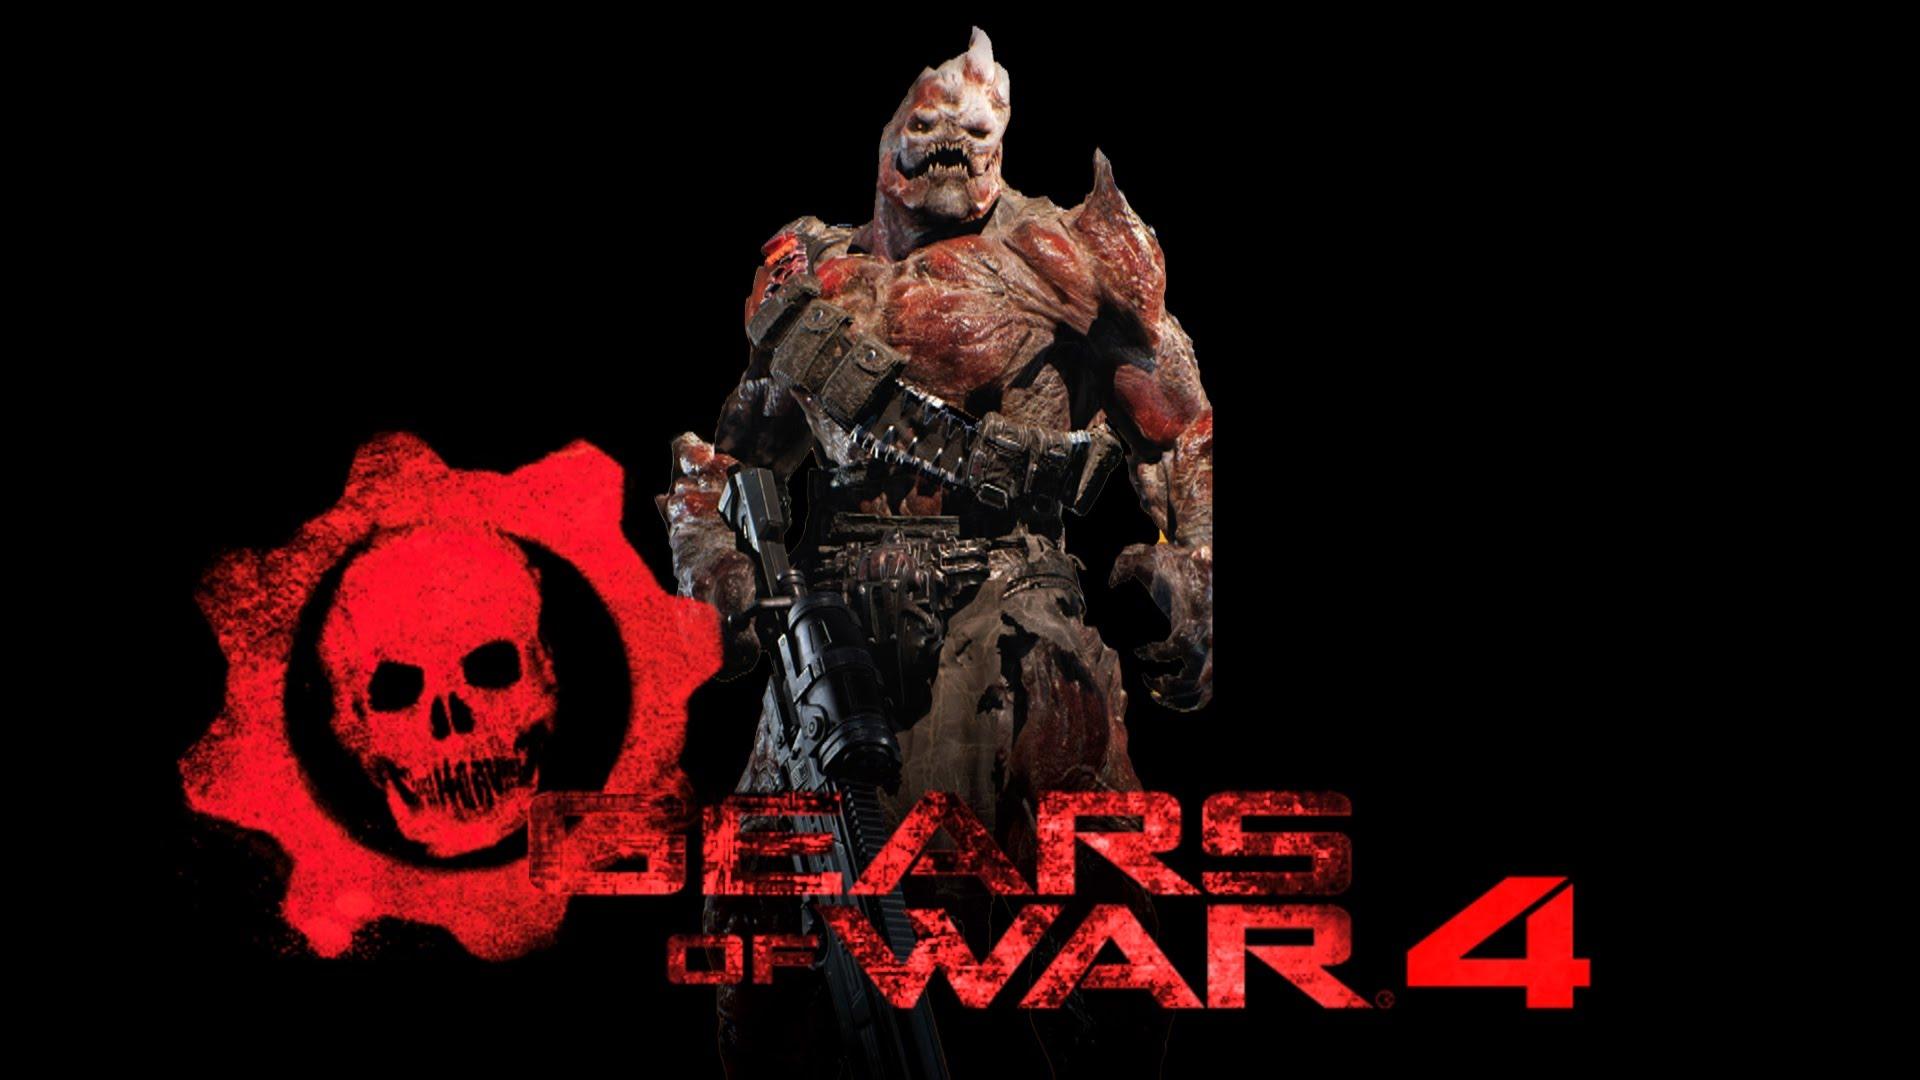 gears of war 4 review